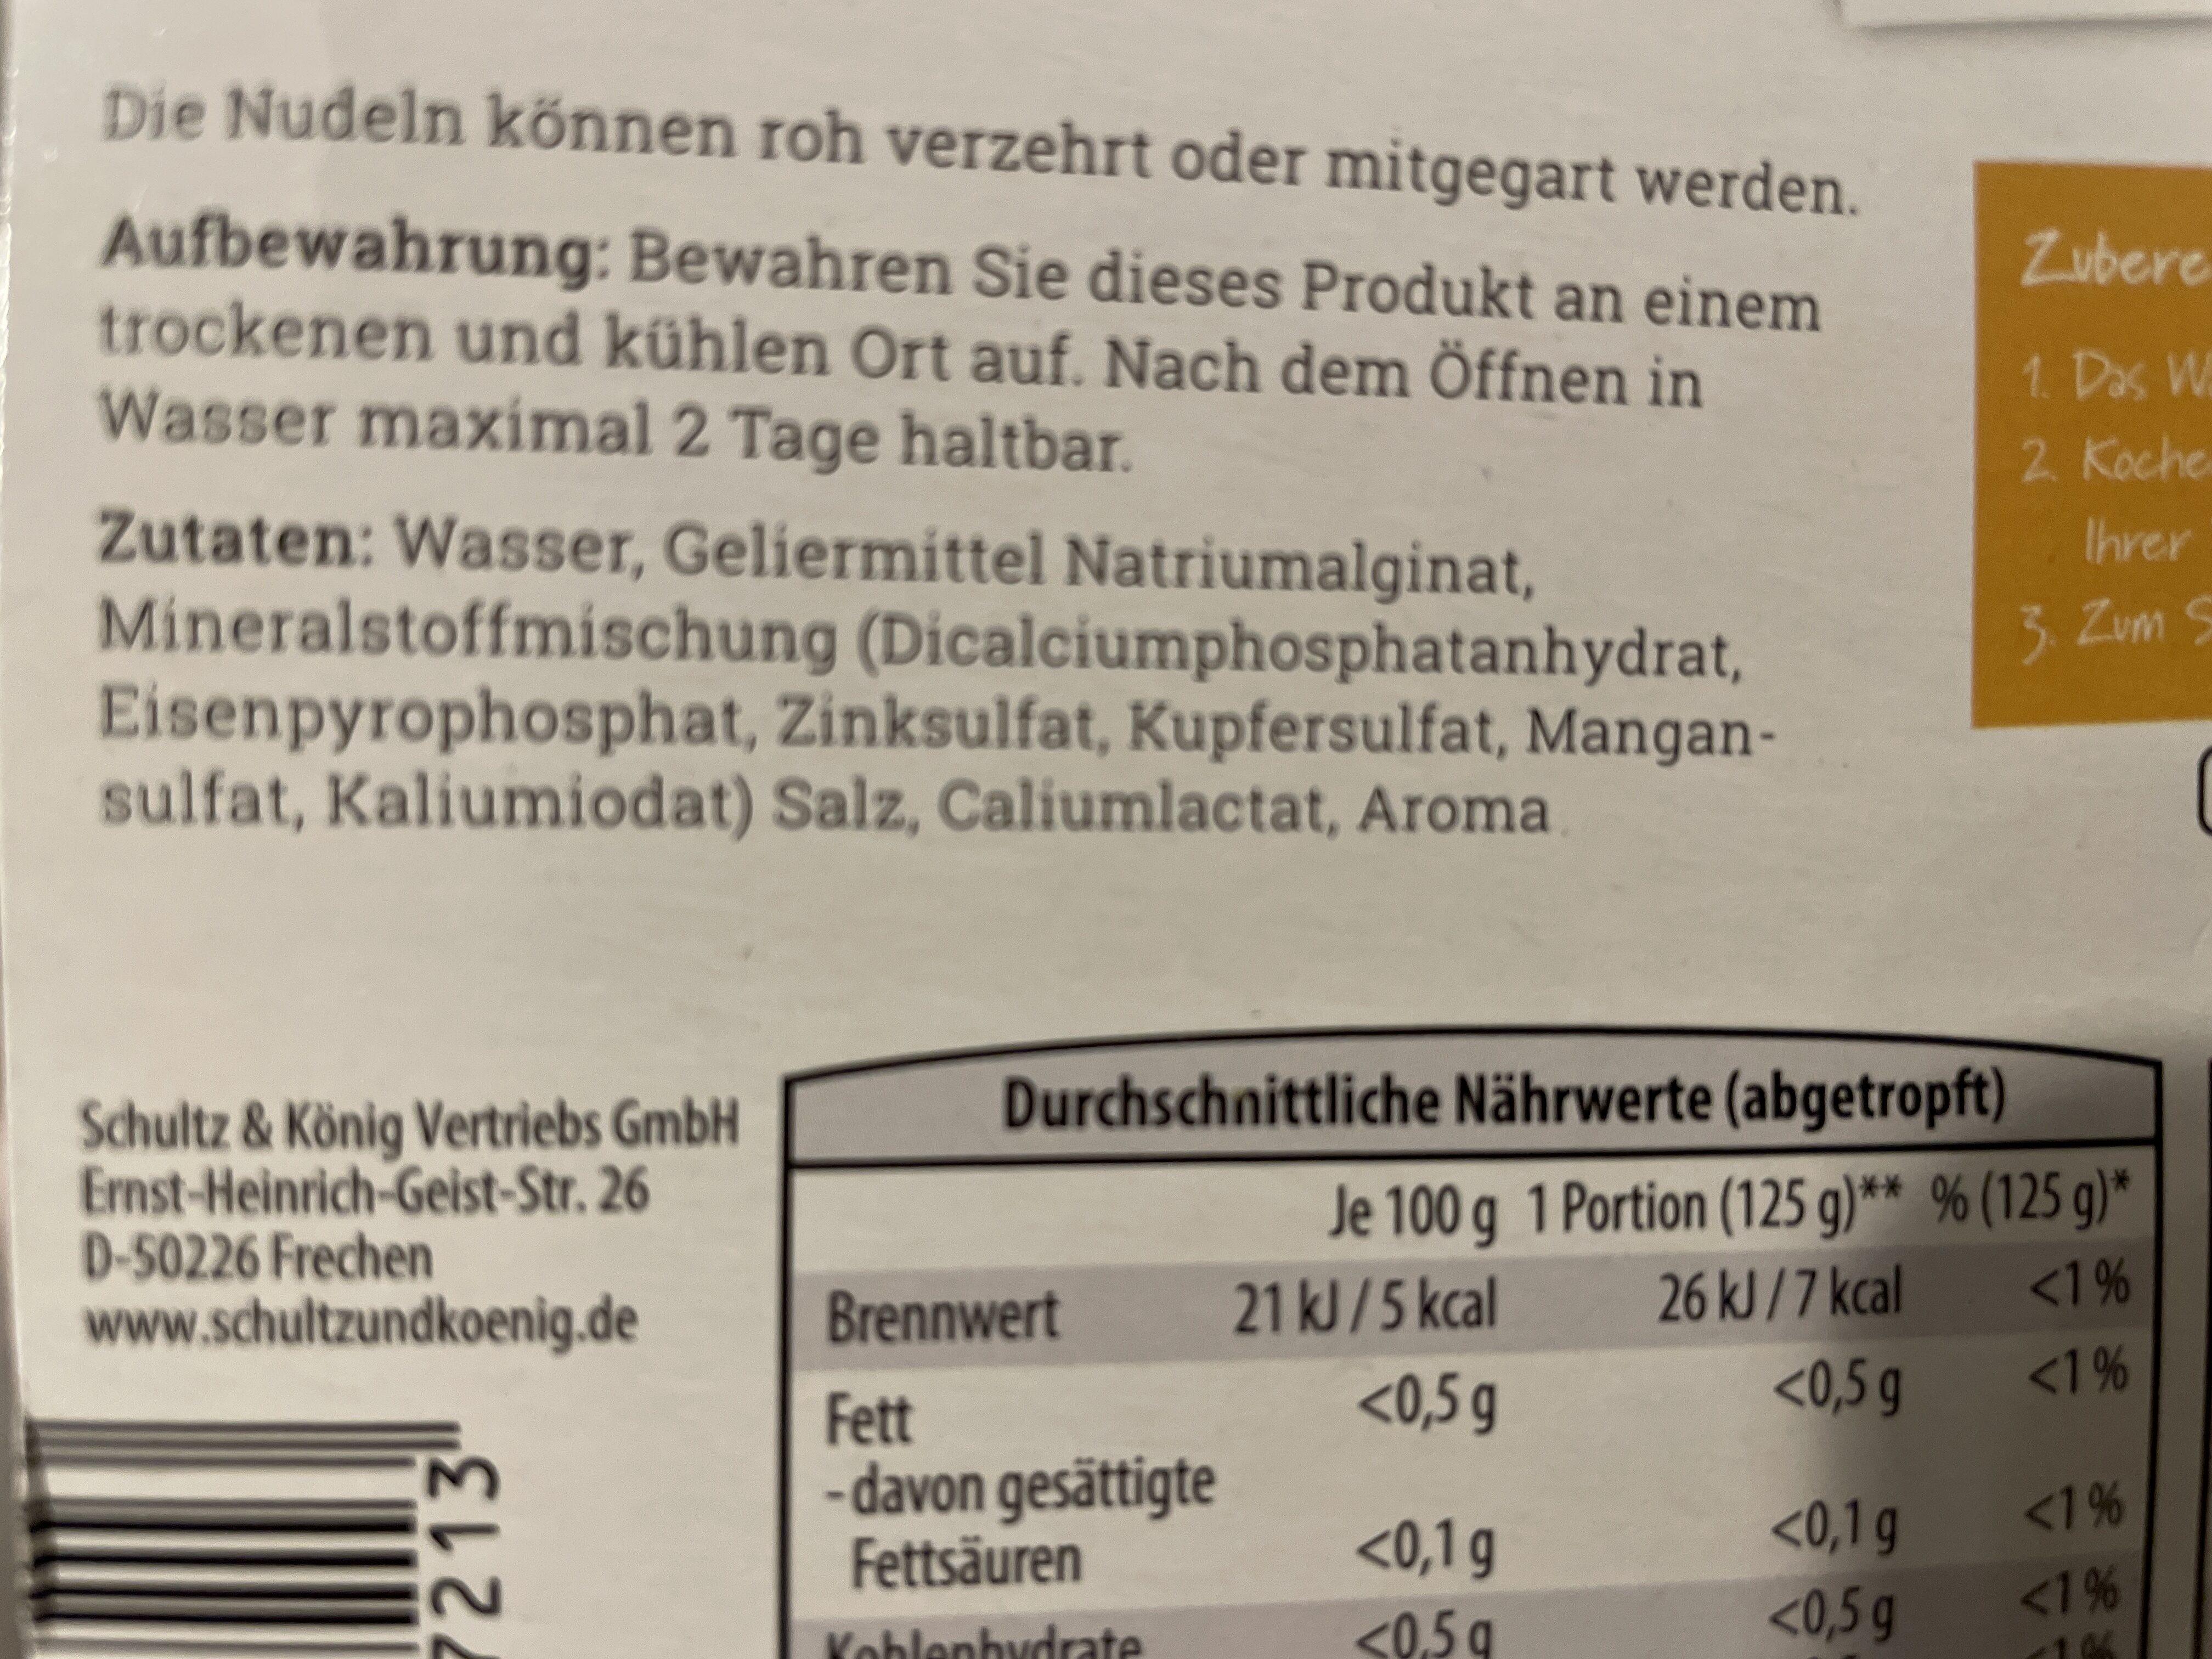 5-Kalorien-Nudeln - Ingredients - en